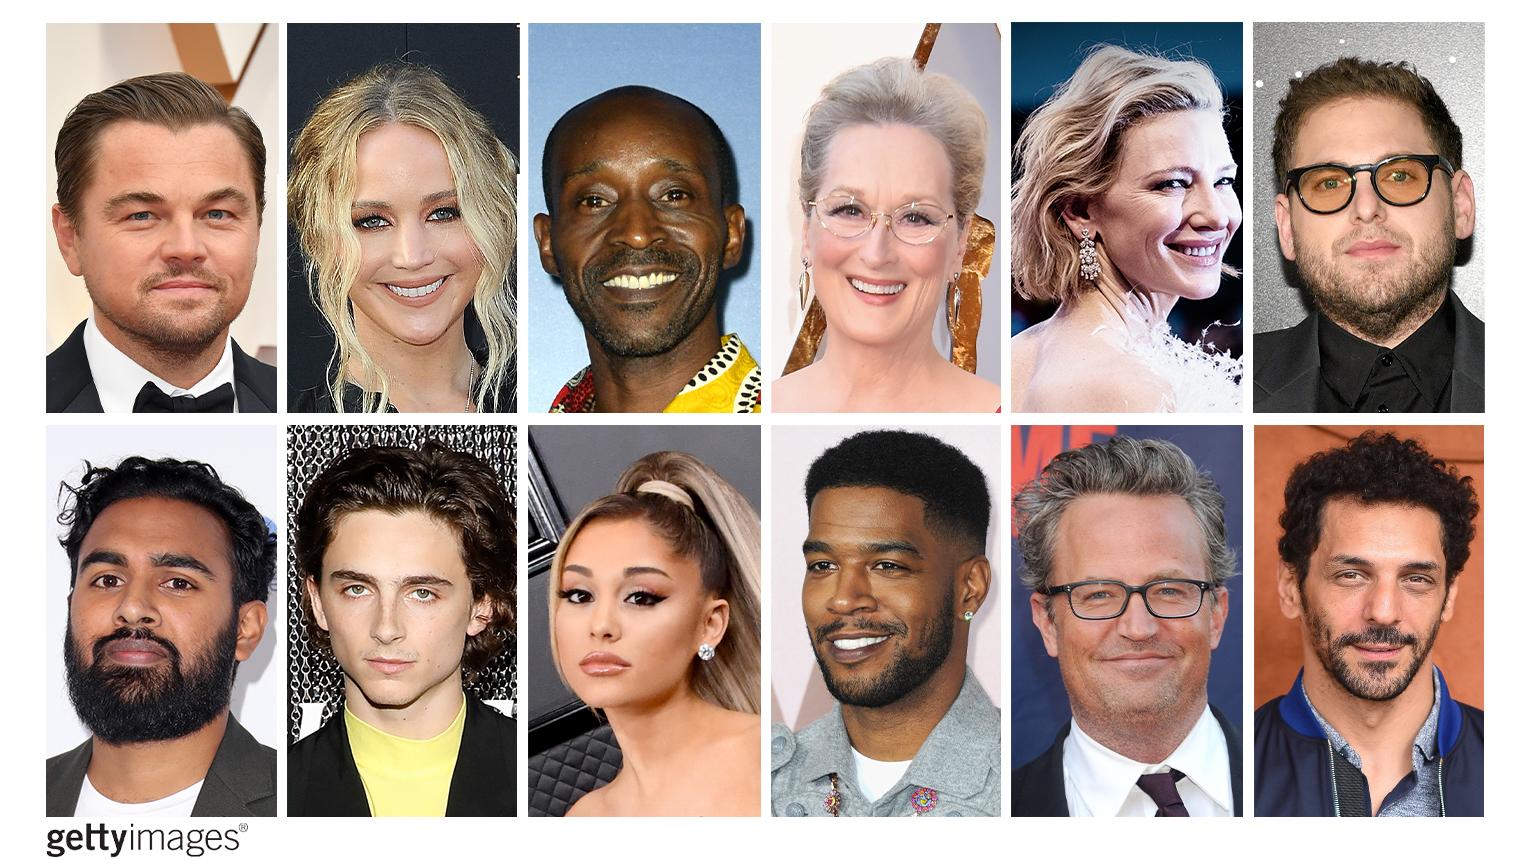 "NetflixFilm on Twitter: ""The cast of Adam McKay's DON'T LOOK UP is  absolutely iconic: 💫Leonardo DiCaprio joins 💫Jennifer Lawrence & 💫Rob  Morgan alongside 💫Meryl Streep 💫Cate Blanchett 💫Jonah Hill 💫Himesh  Patel 💫Timothée"